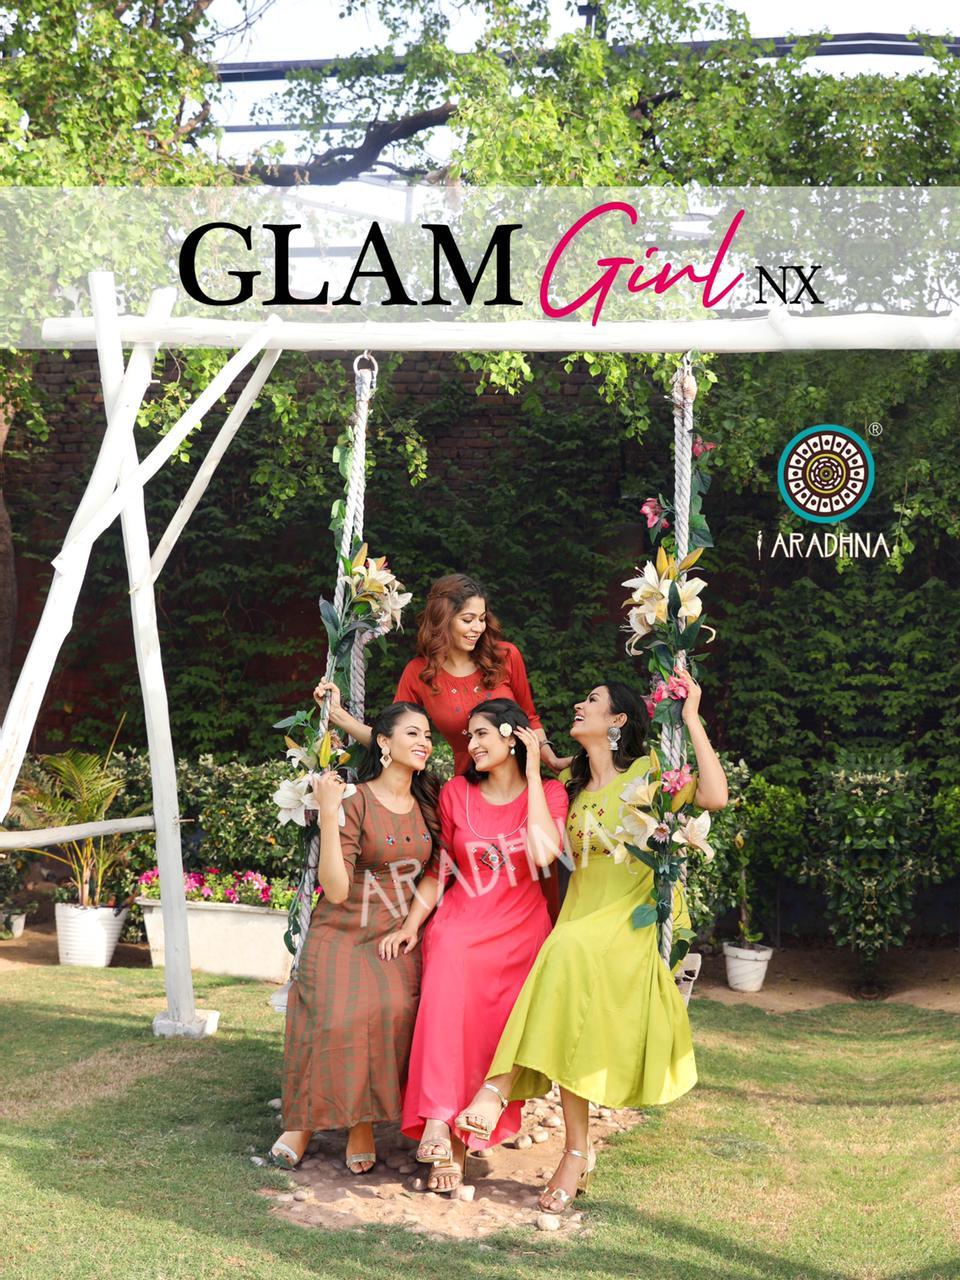 Aradhna Glam Girl Nx Kurti Wholesale Catalog 7 Pcs 5 - Aradhna Glam Girl Nx Kurti Wholesale Catalog 7 Pcs